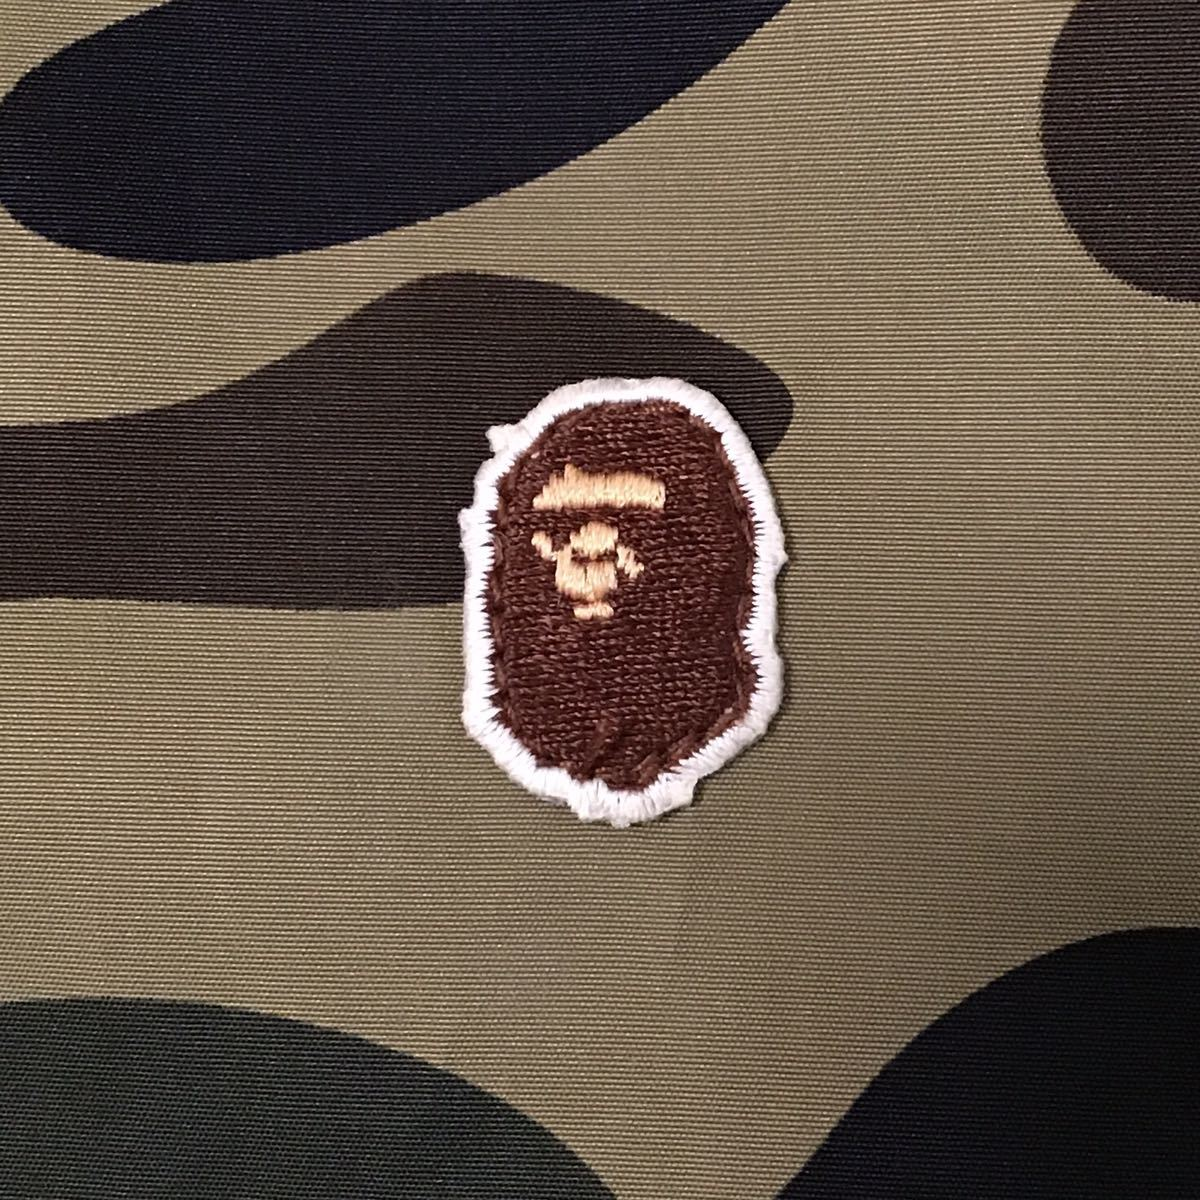 1st camo green ナイロン パーカー Mサイズ a bathing ape BAPE full zip hoodie エイプ ベイプ アベイシングエイプ 迷彩 2555